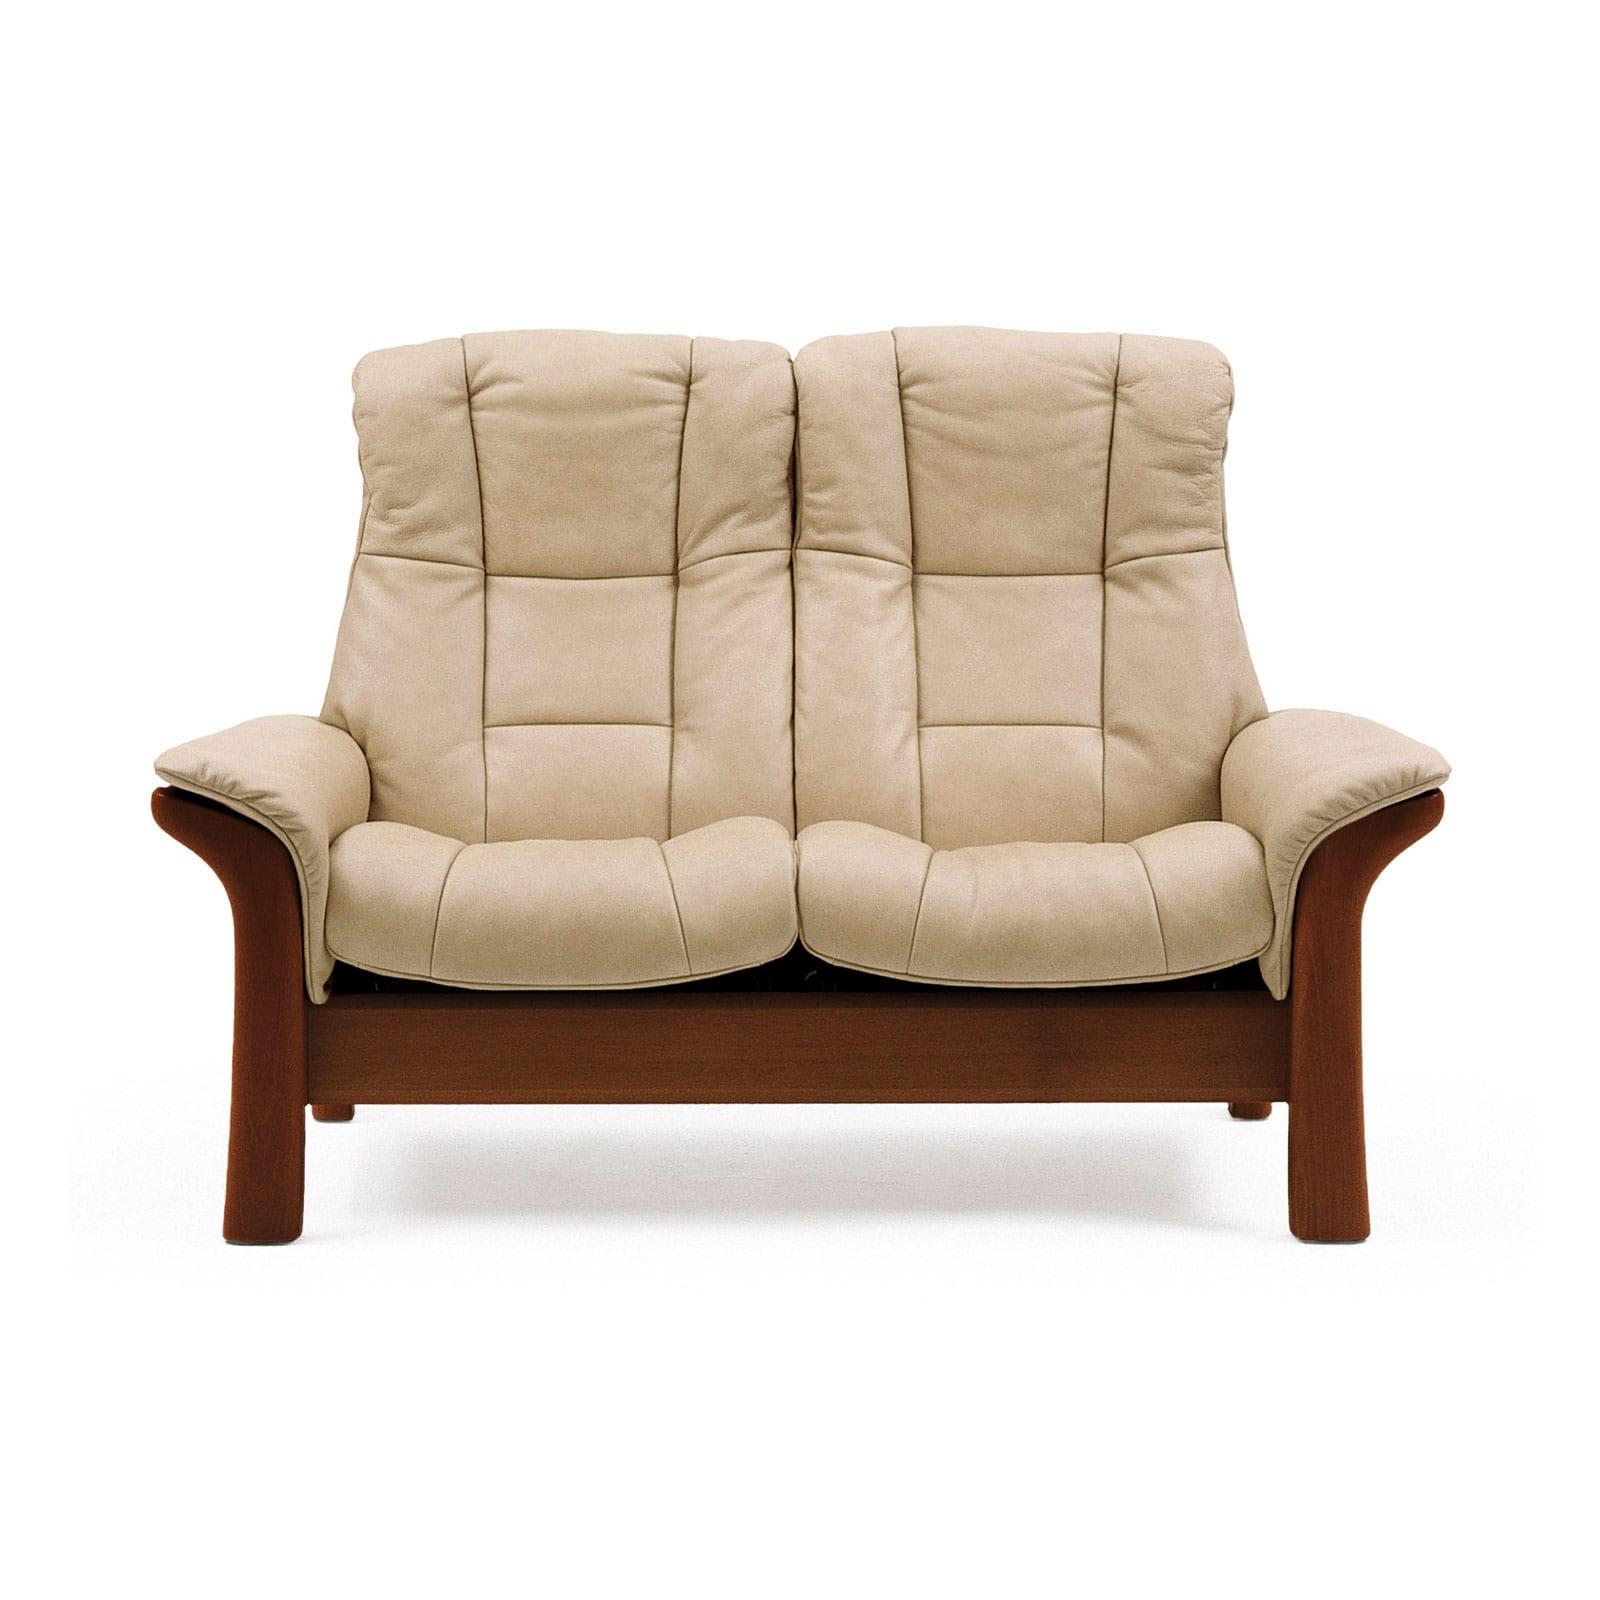 Full Size of Sofa Leder Braun Chesterfield Couch Vintage Ledersofa Design Kaufen Gebraucht Otto 3 Sitzer   3 2 1 2 Sitzer Ikea Rustikal Set Stressless Windsor M Sitzer Sofa Sofa Leder Braun